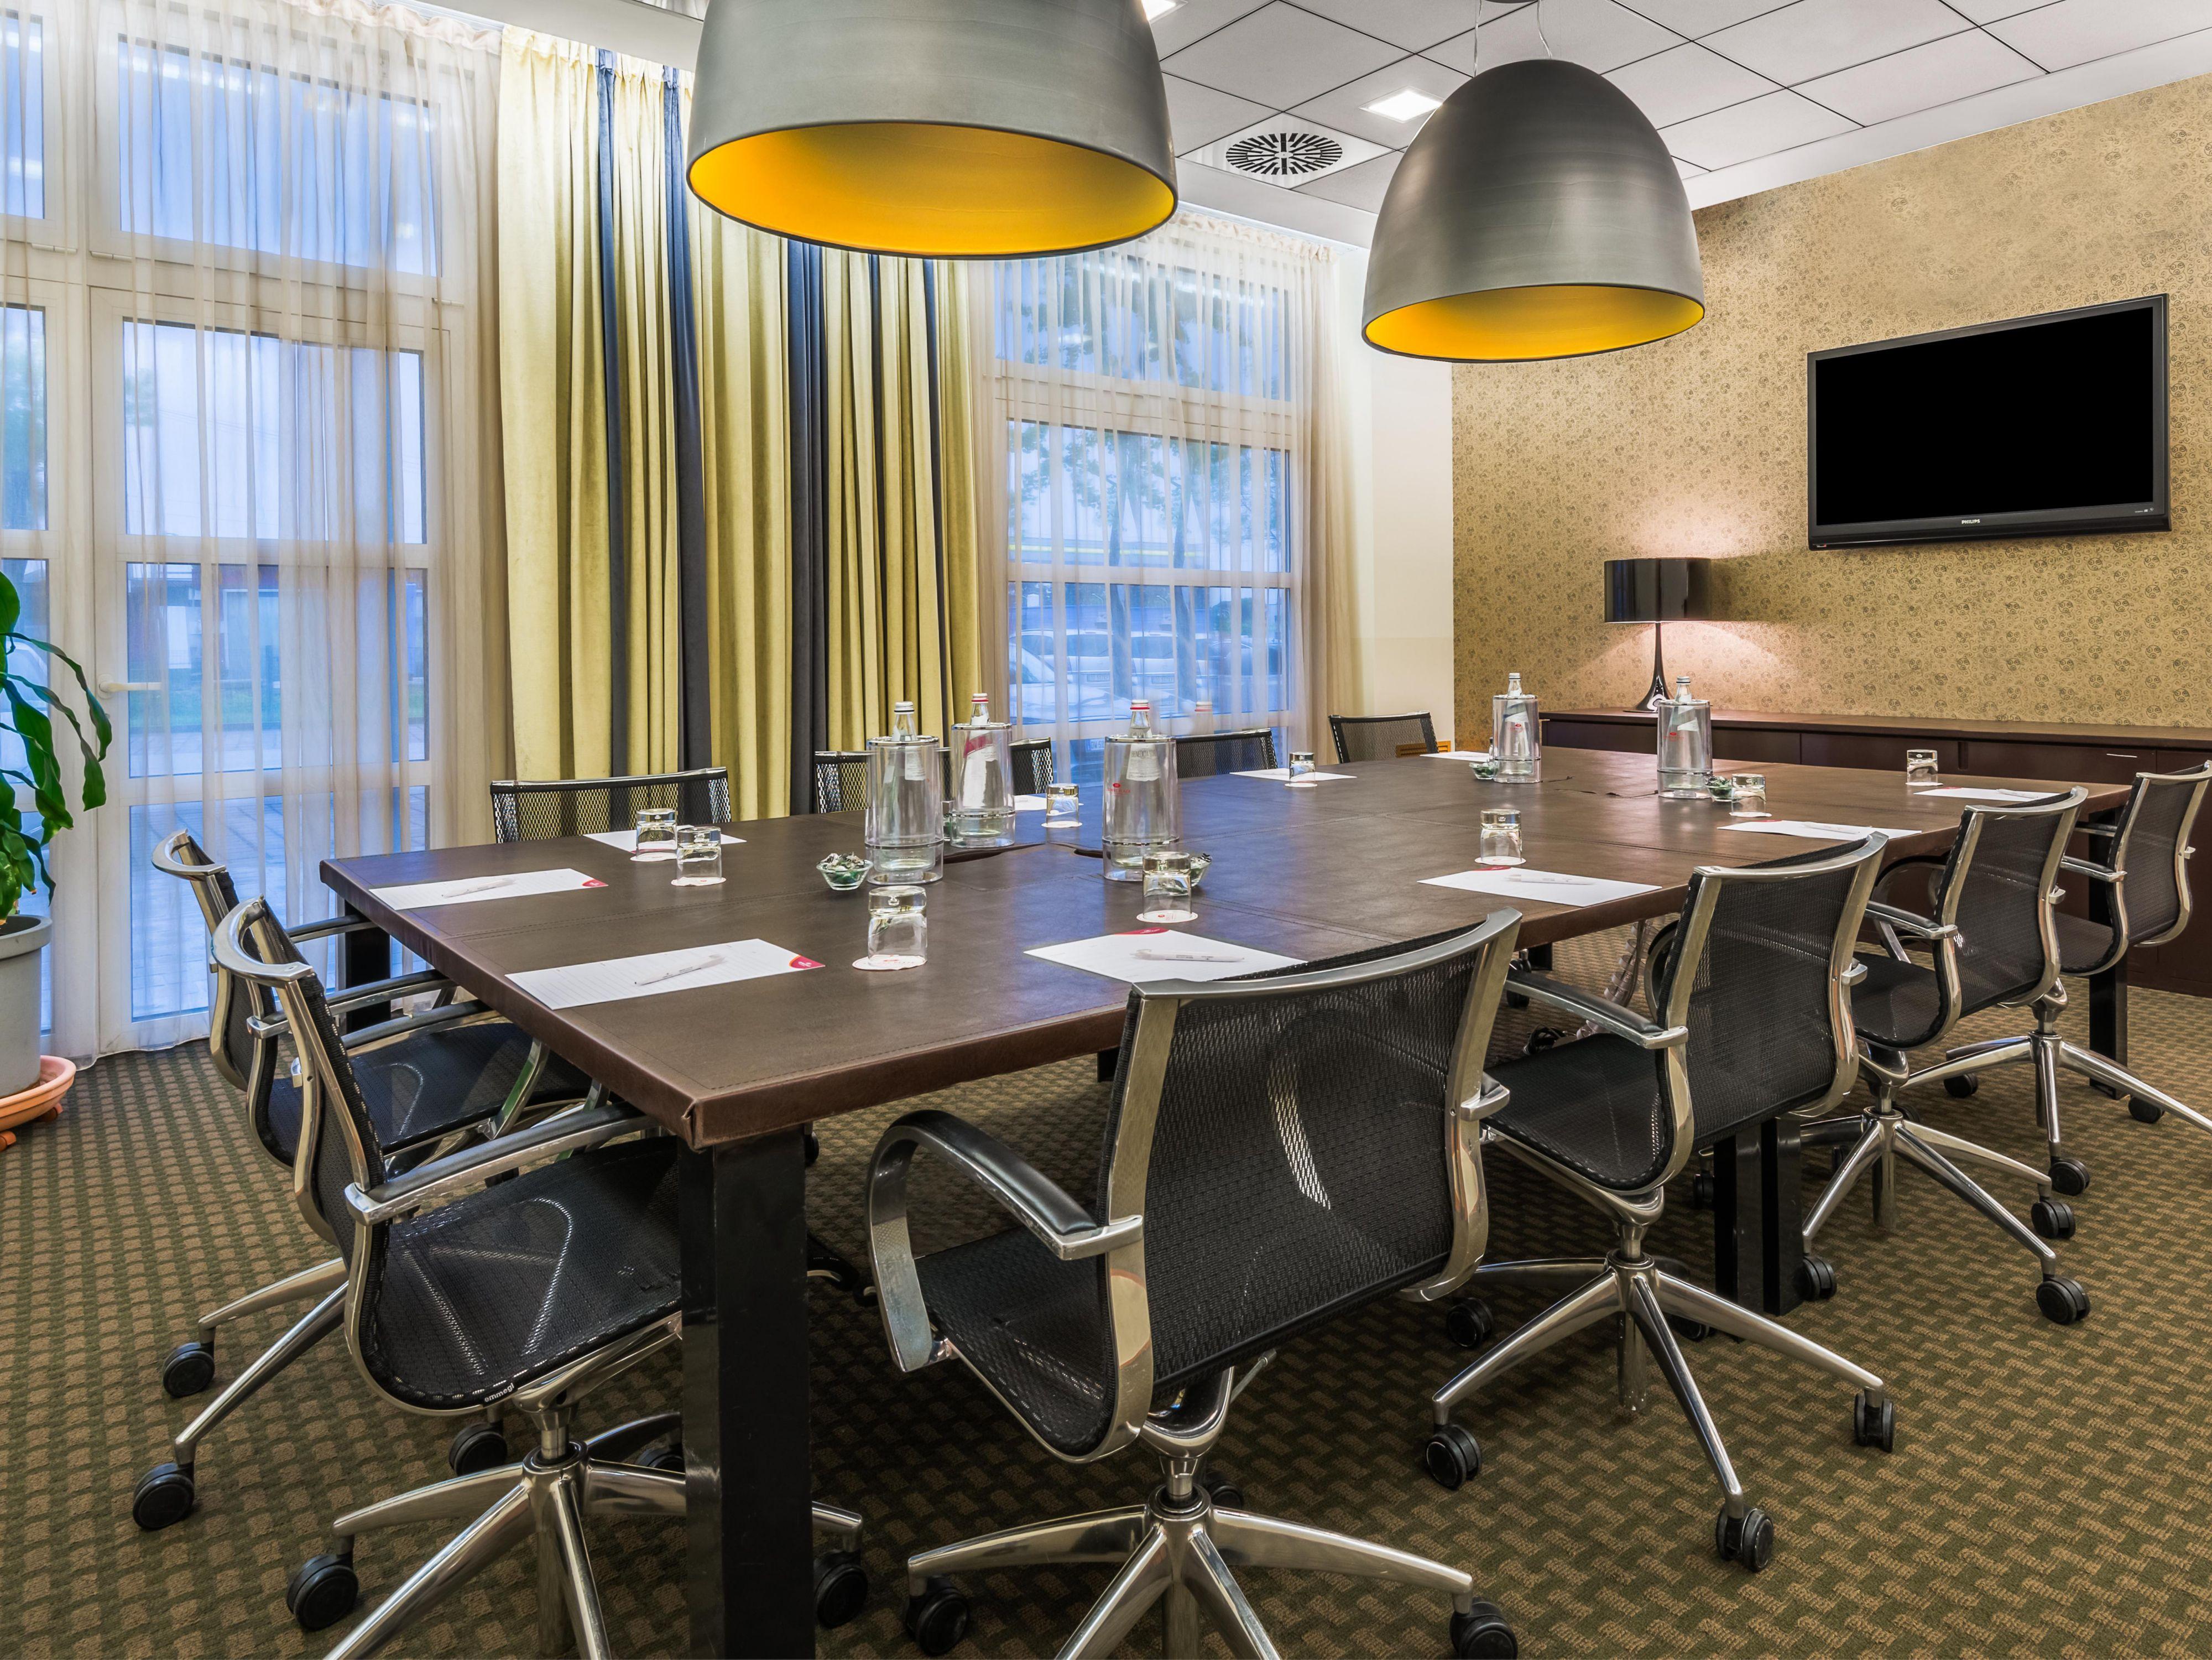 Sale Riunioni Padova : Crowne plaza padova hotel meeting rooms for rent